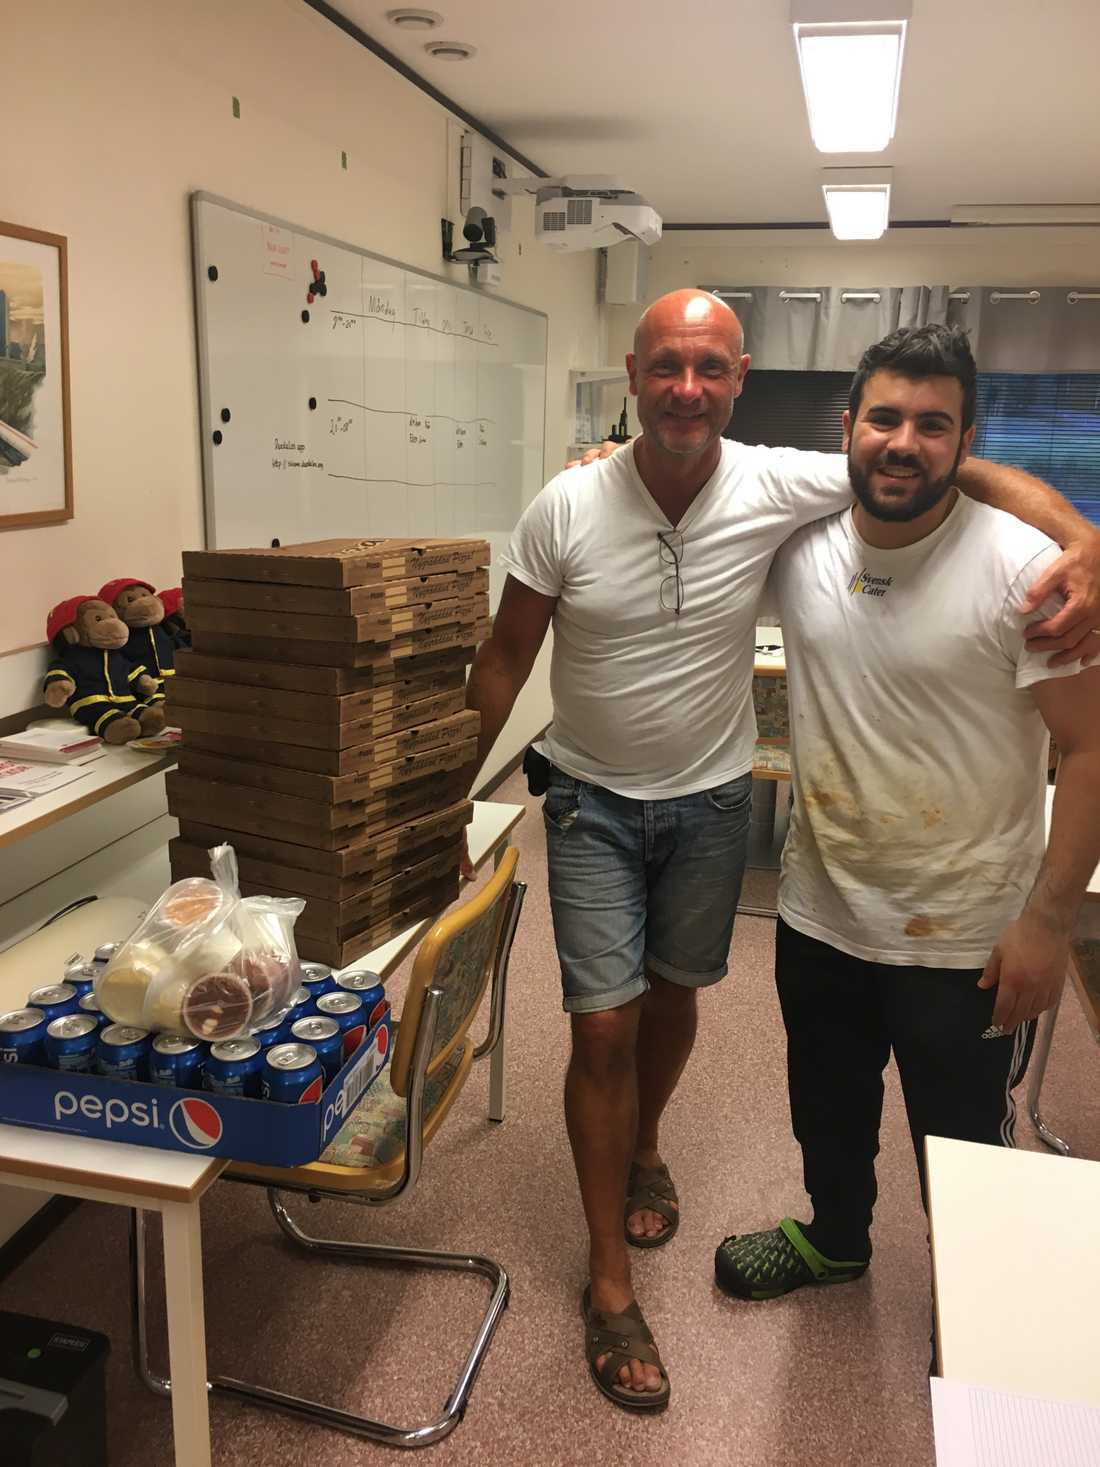 Styrkeledaren Rodel Eriksson tog emot pizzabudet.